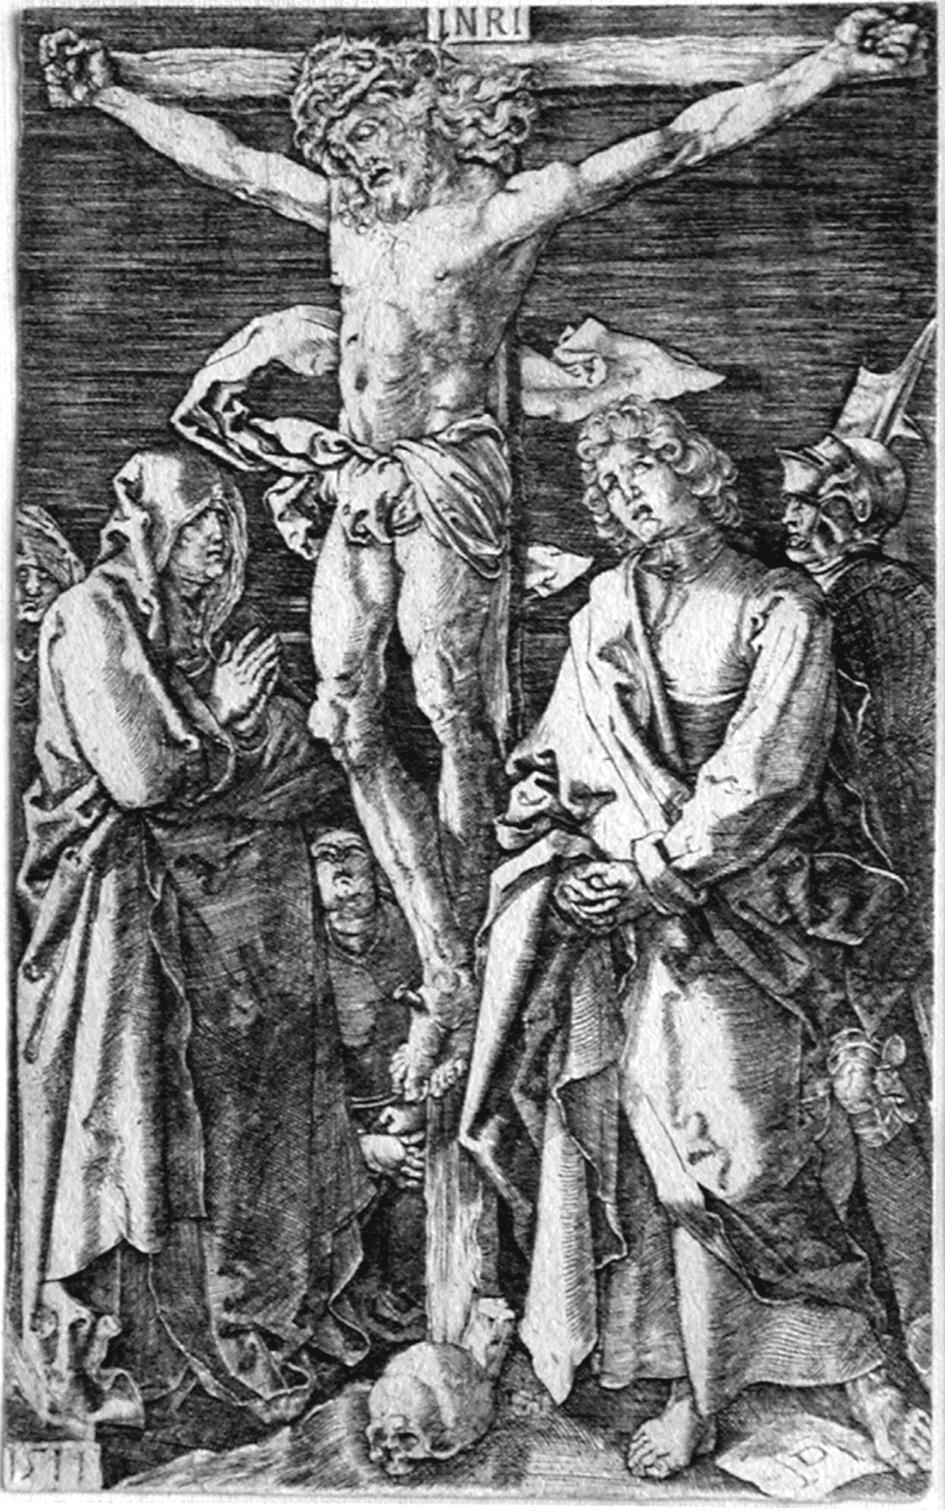 Durer A; La crocefissione